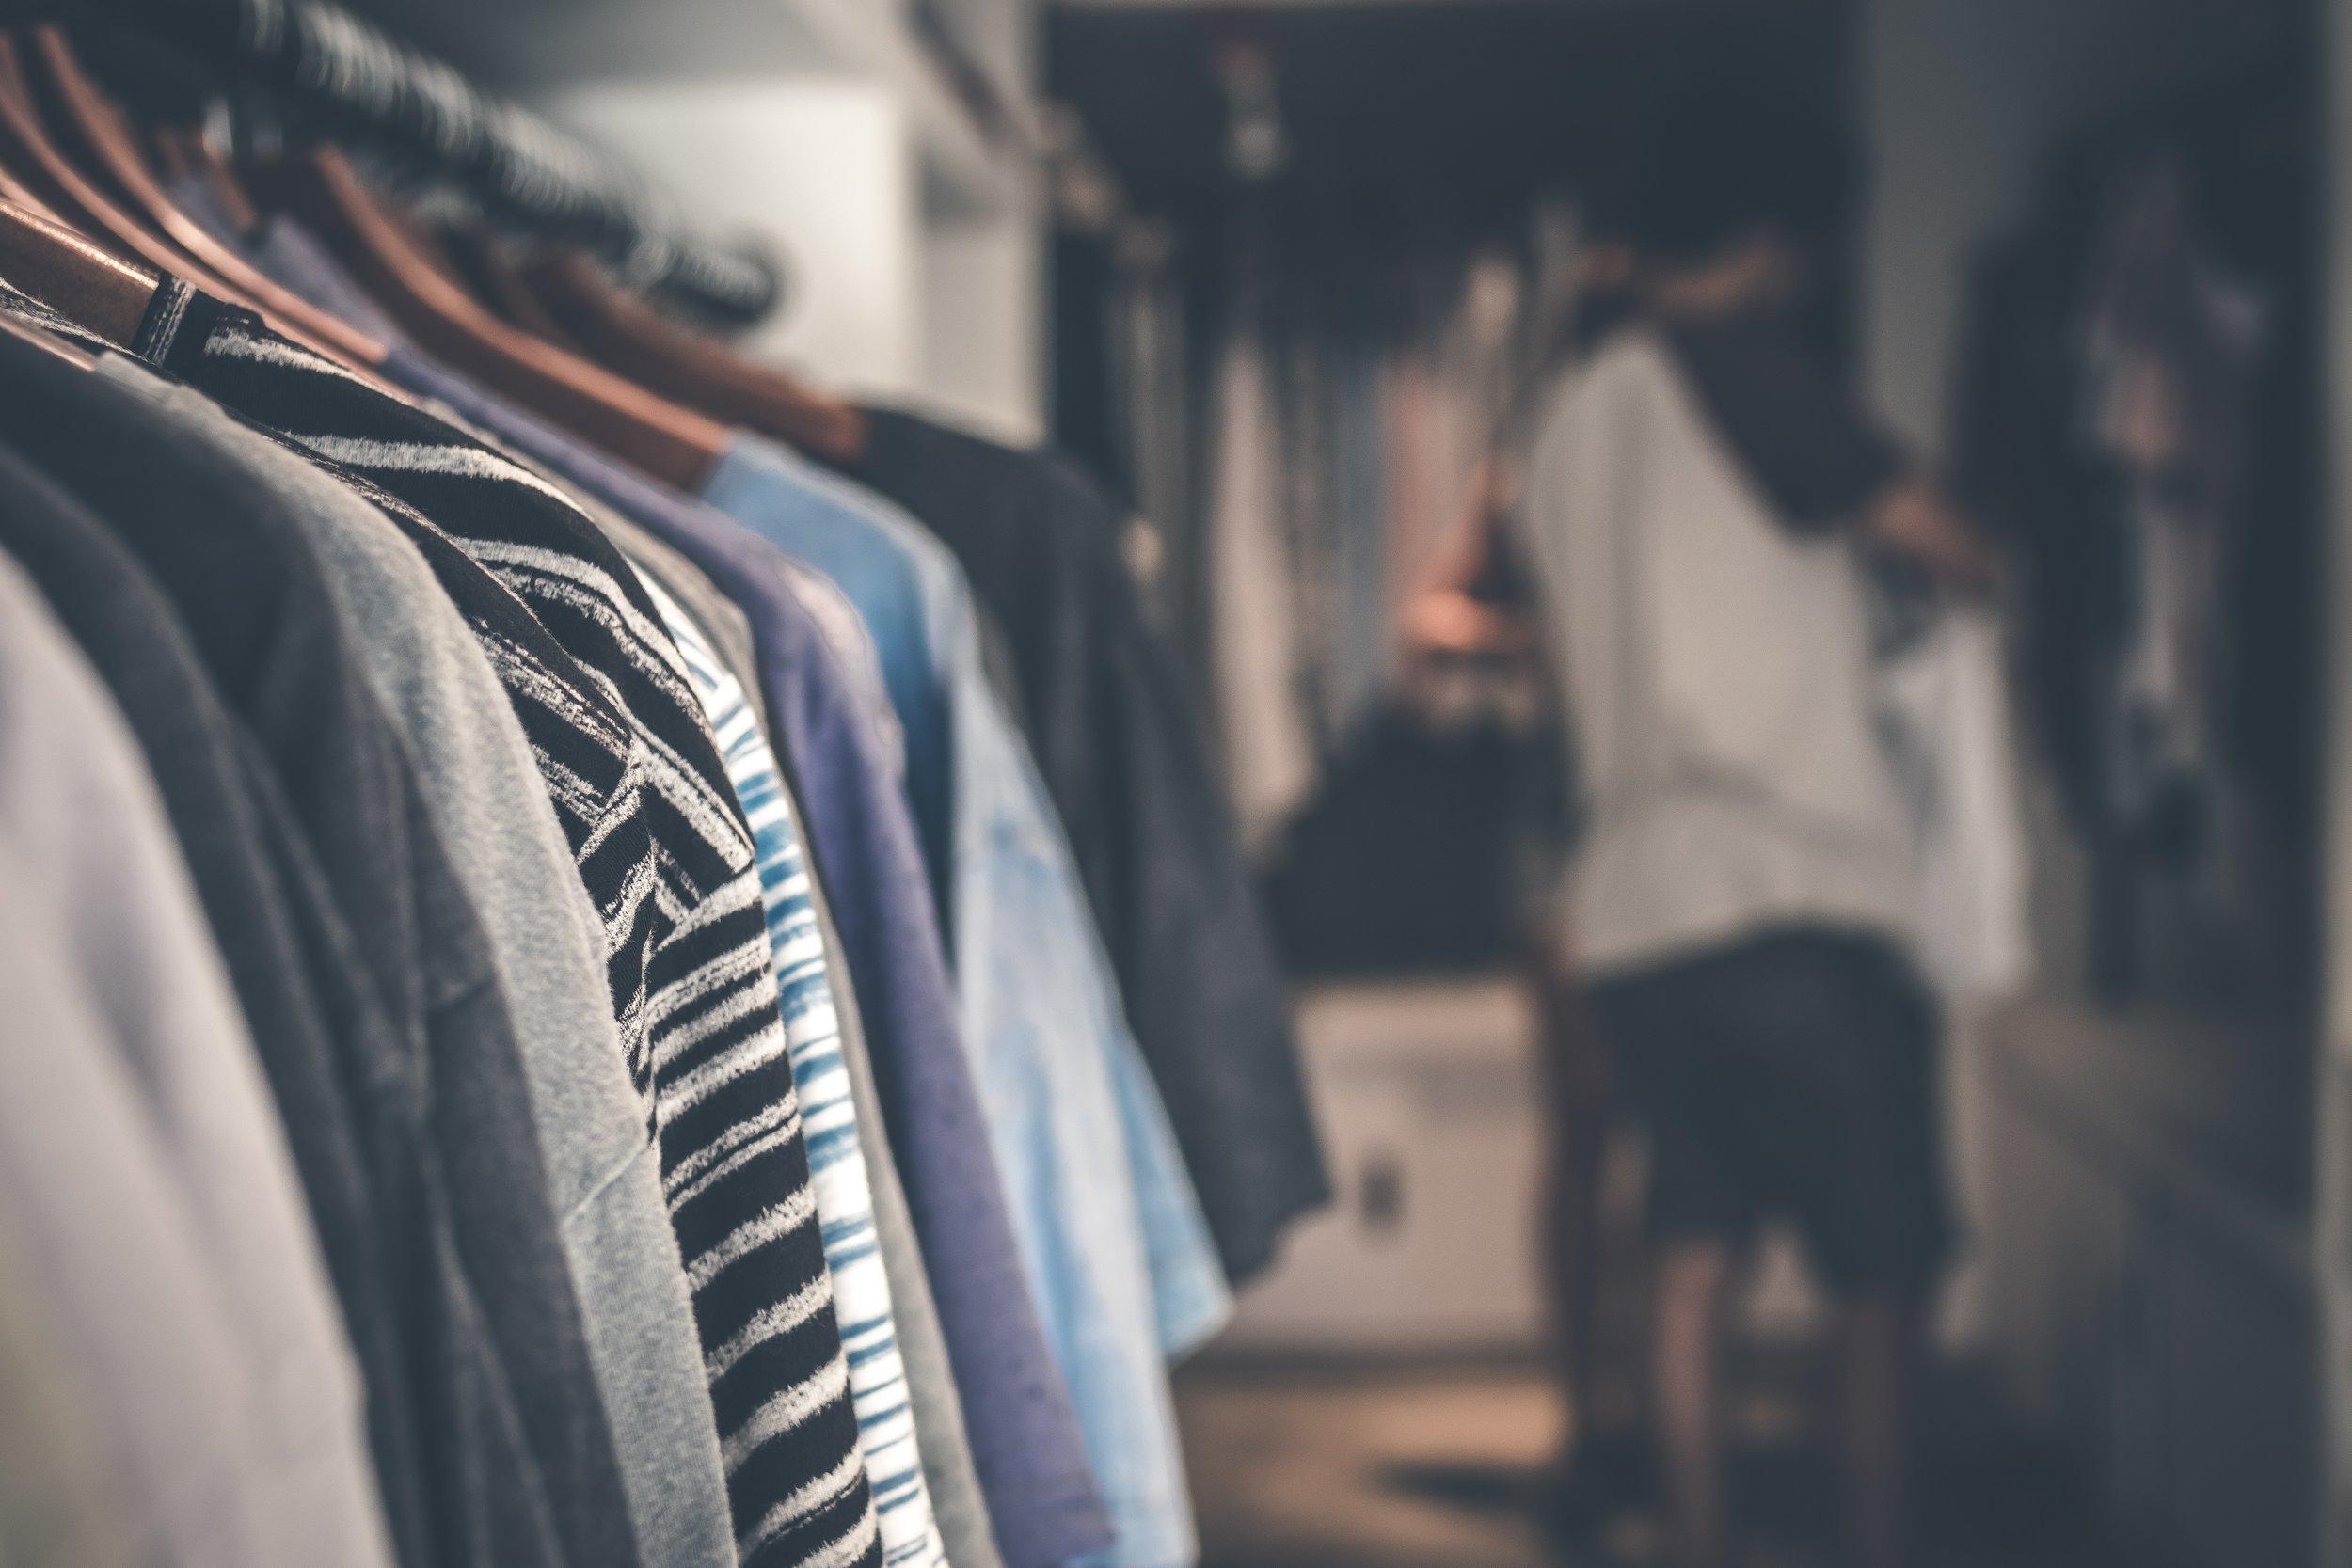 apparel-attire-blur-994517.jpg